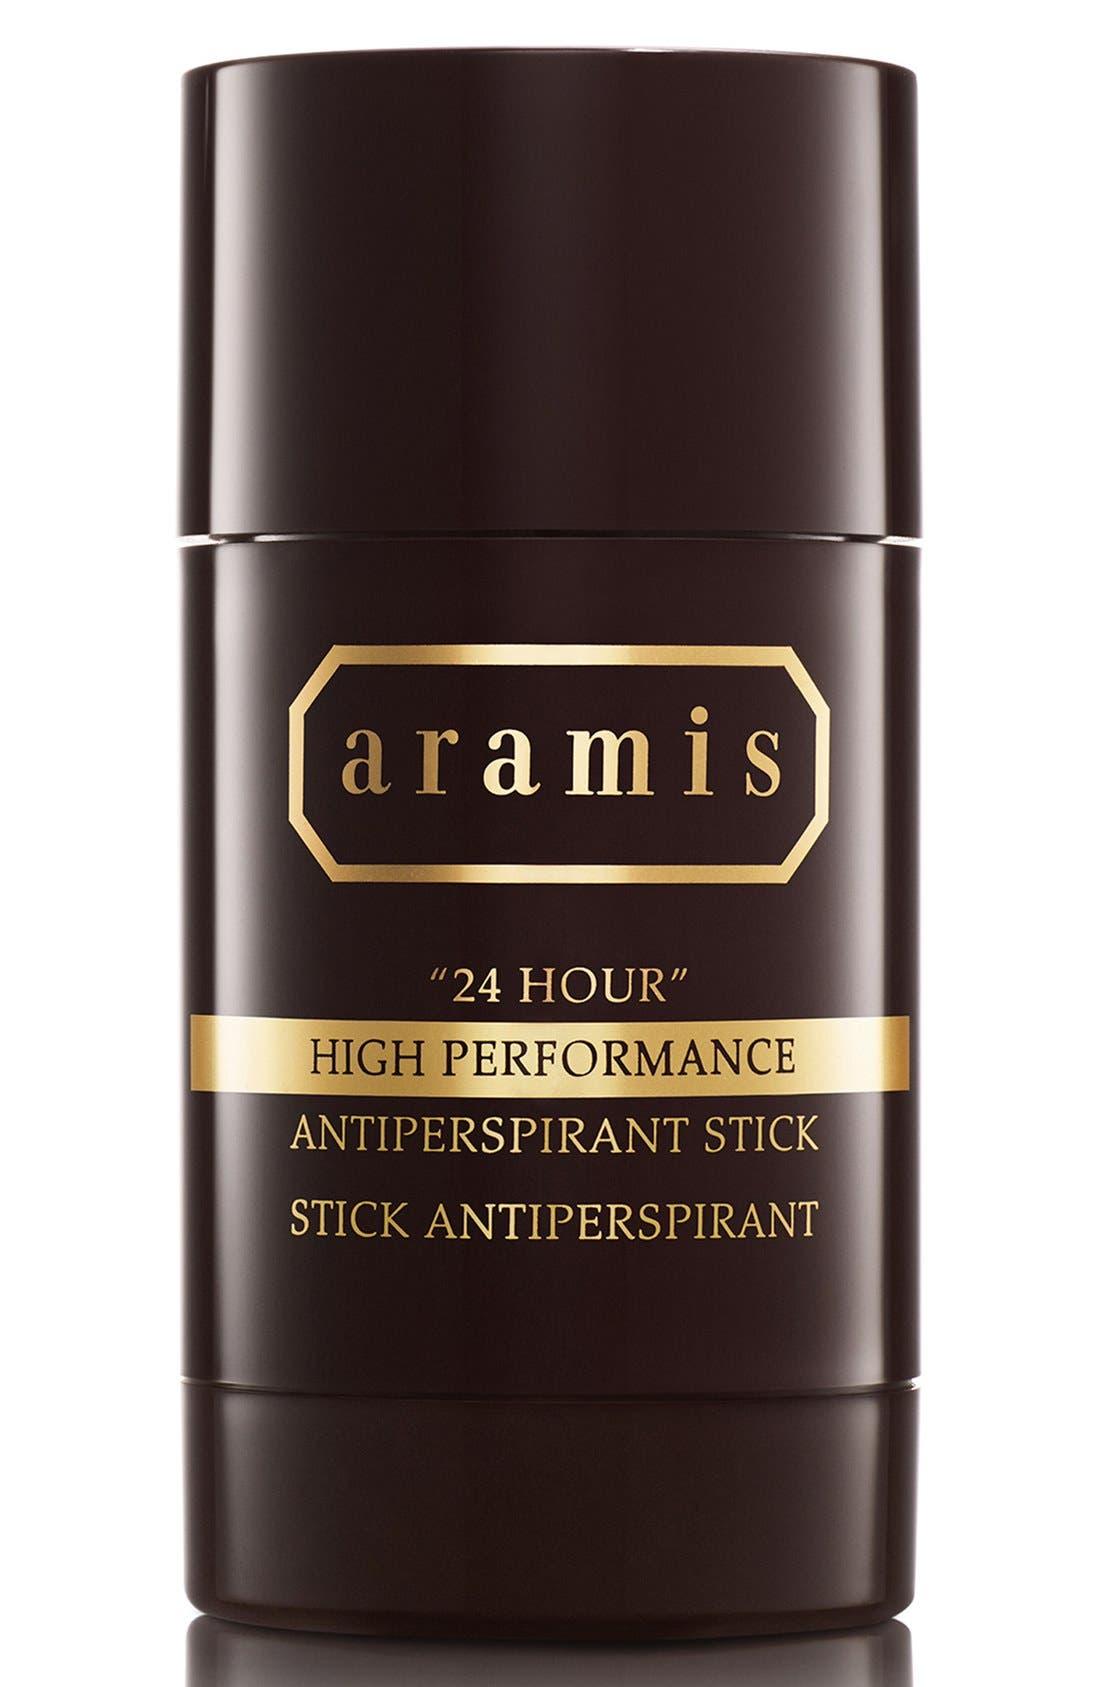 Aramis '24 Hour' High Performance Antiperspirant Stick